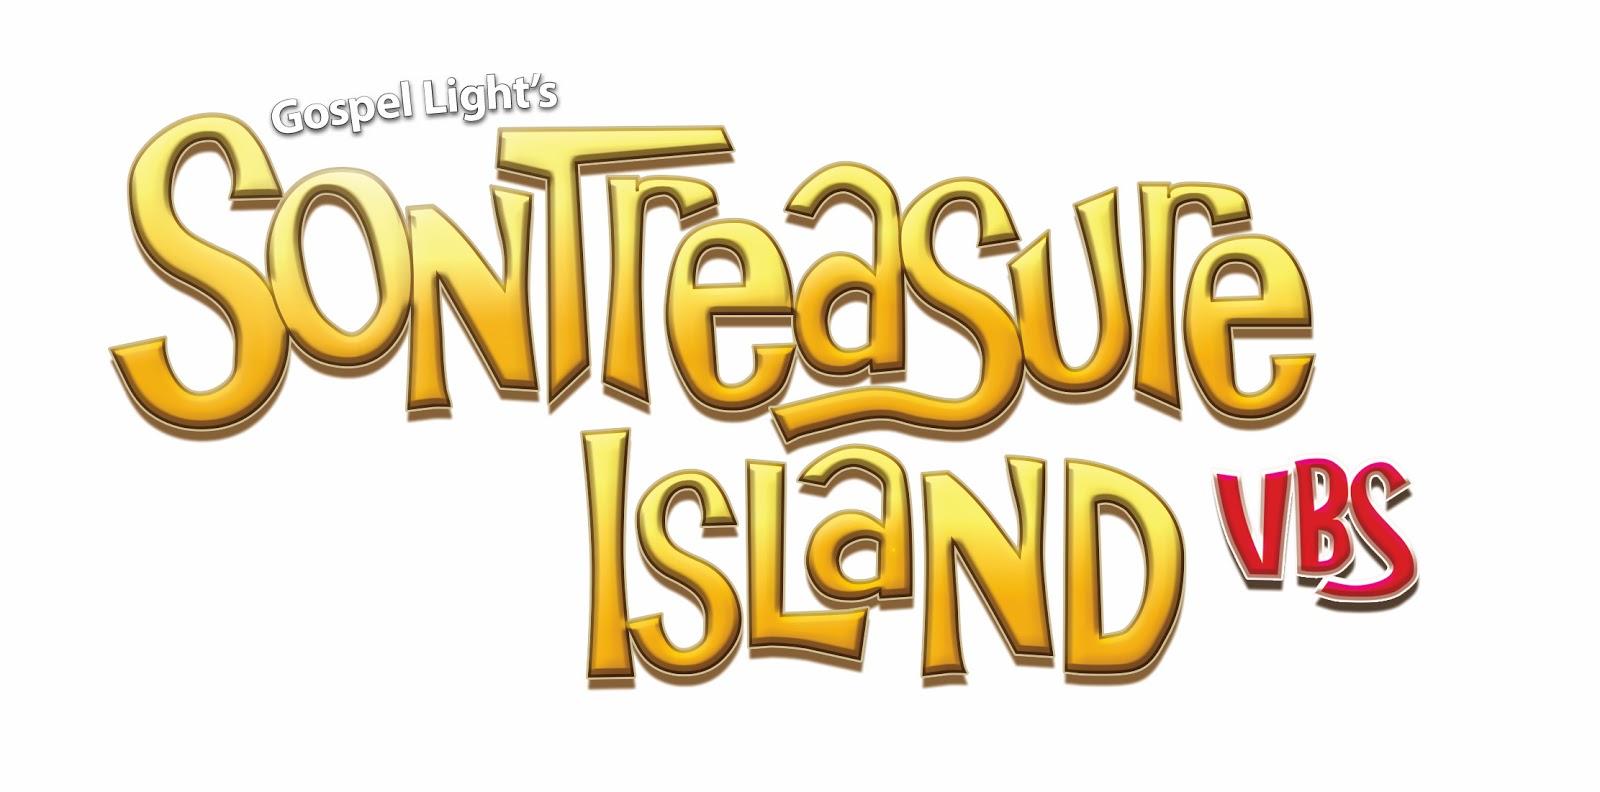 Delightful VBS 2014   SonTreasure Island By Gospel Light U0026 Give Away! Good Ideas